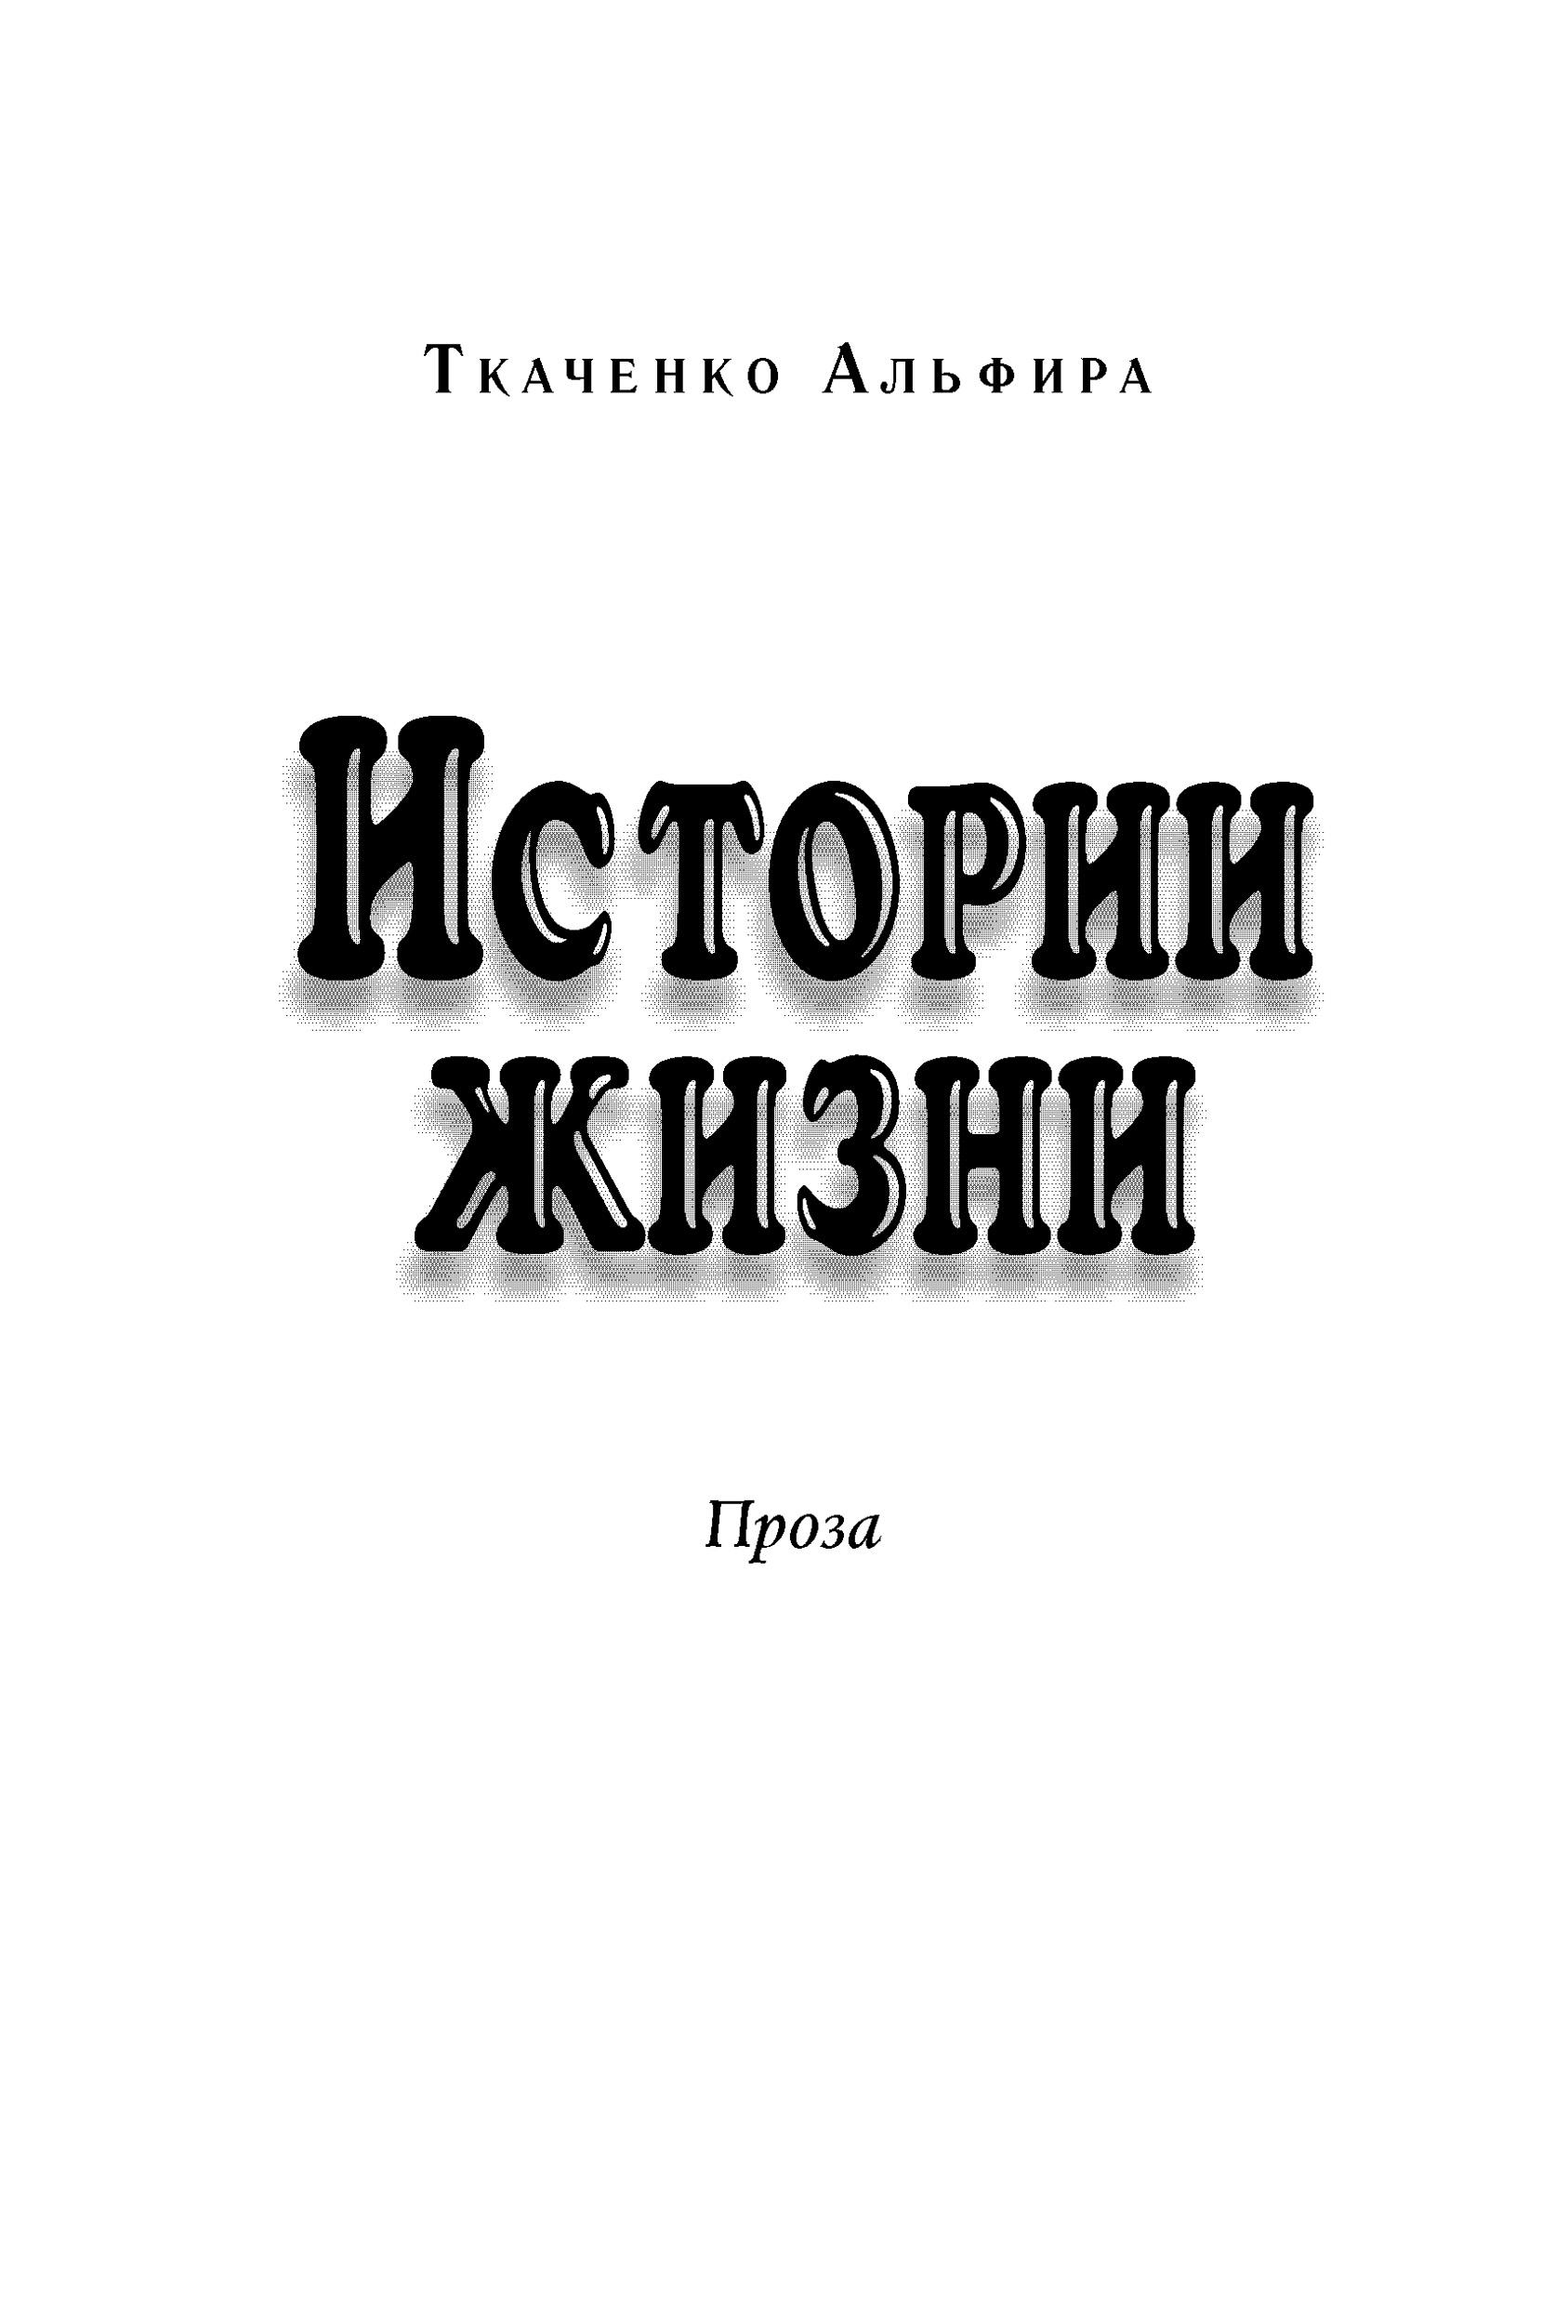 Истории жизни. Проза (сборник)